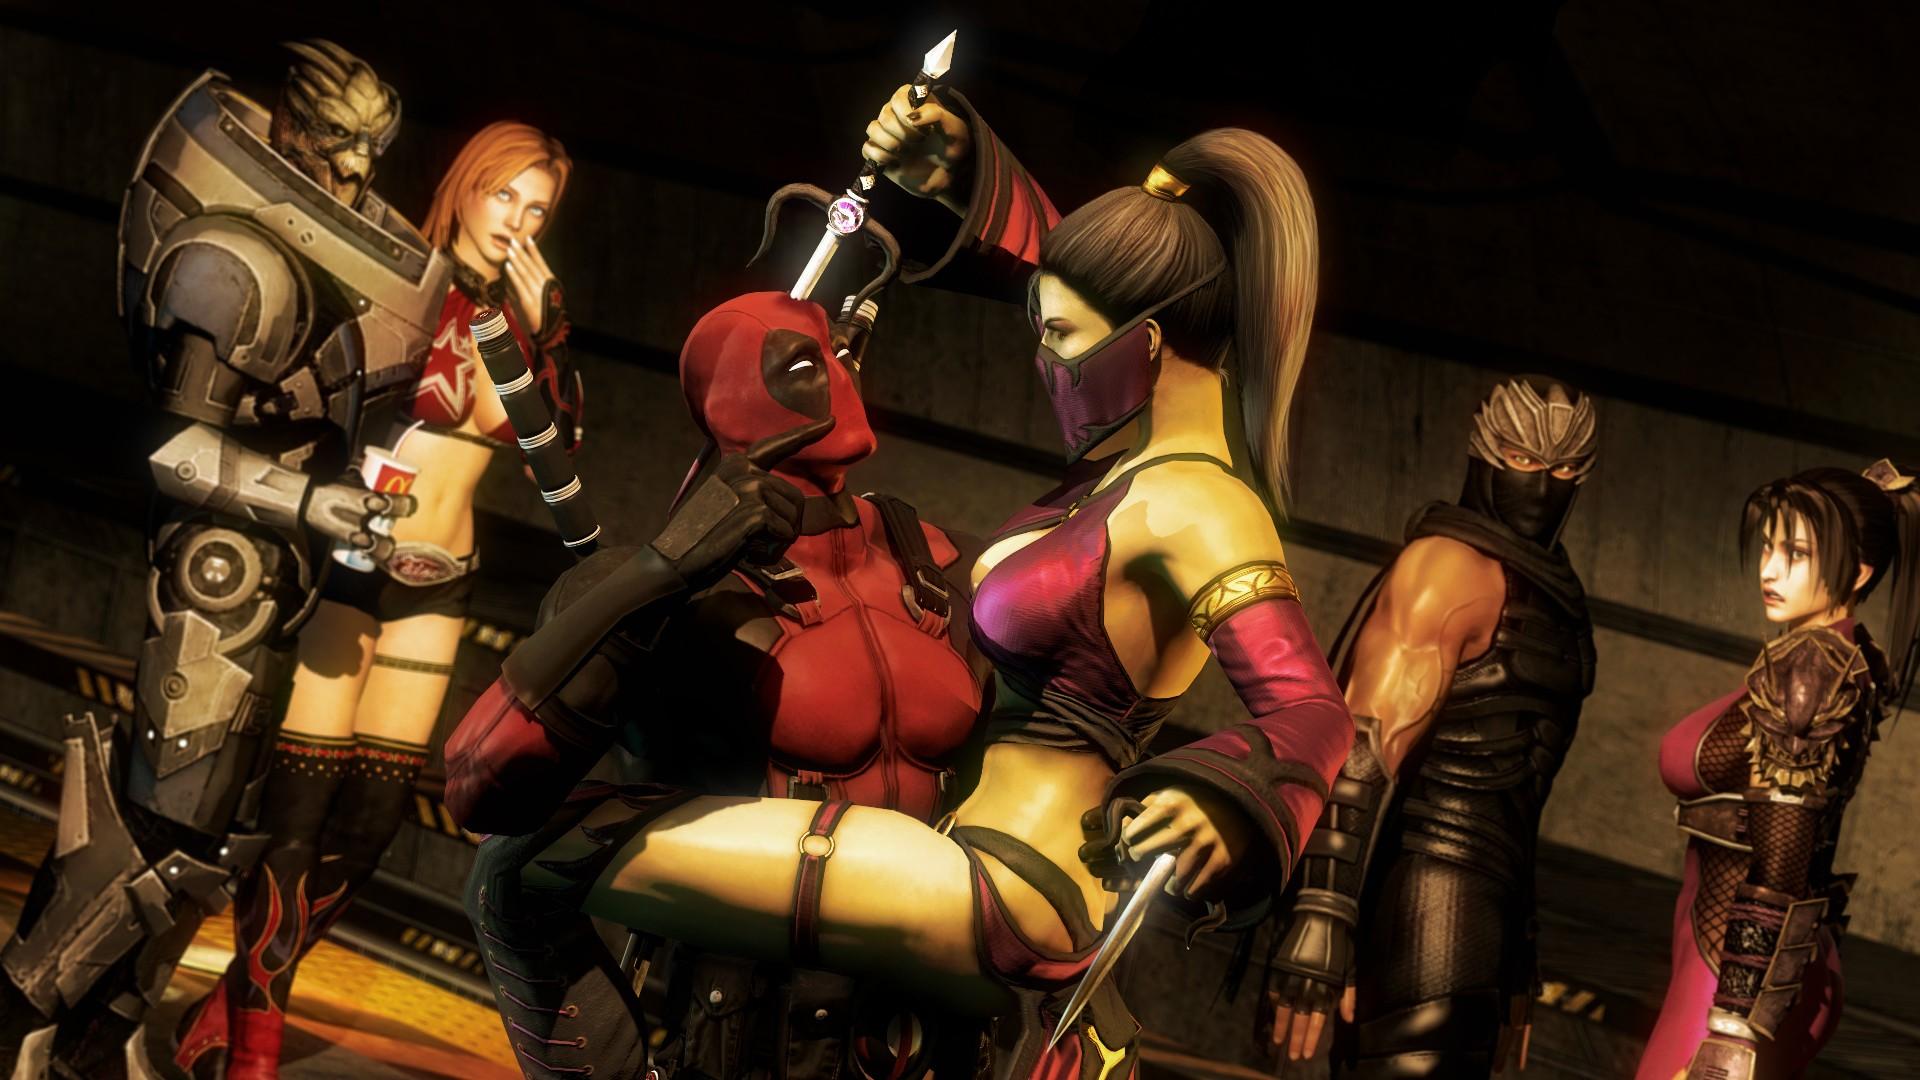 Marvel heroes hentai videos sex toons